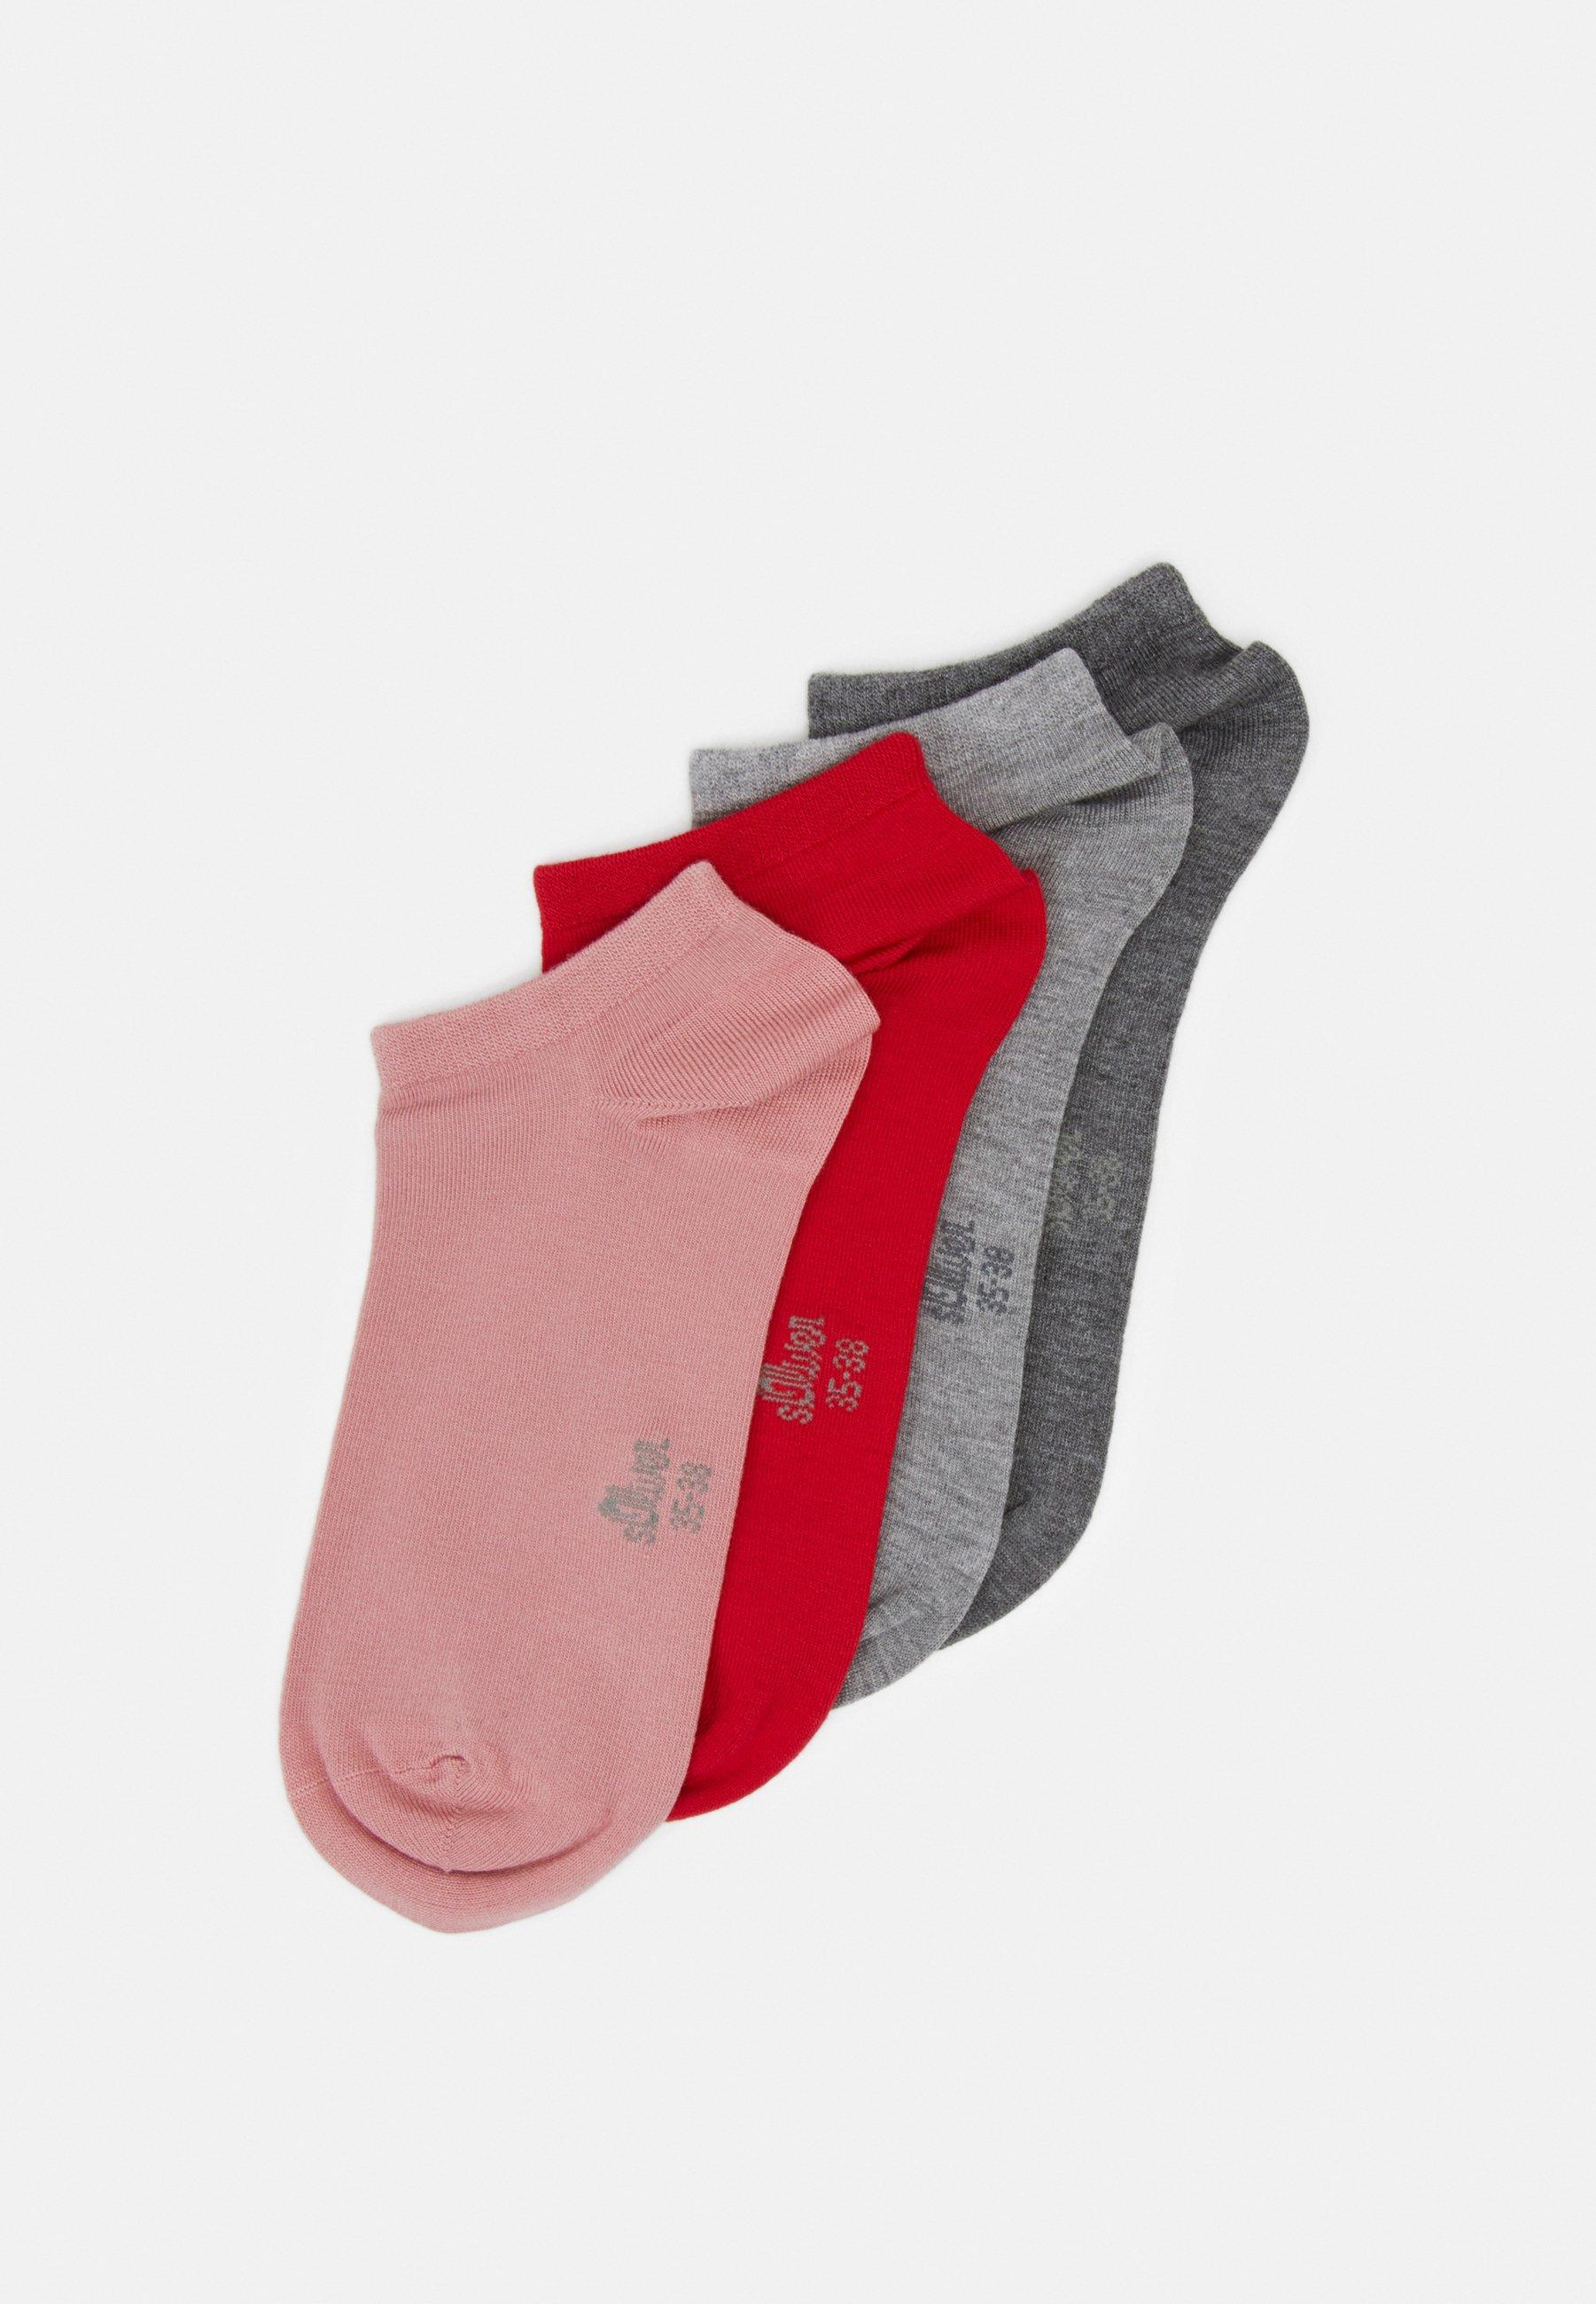 Femme ONLINE WOMEN SILKY TOUCH SNEAKER 5 PACK - Chaussettes